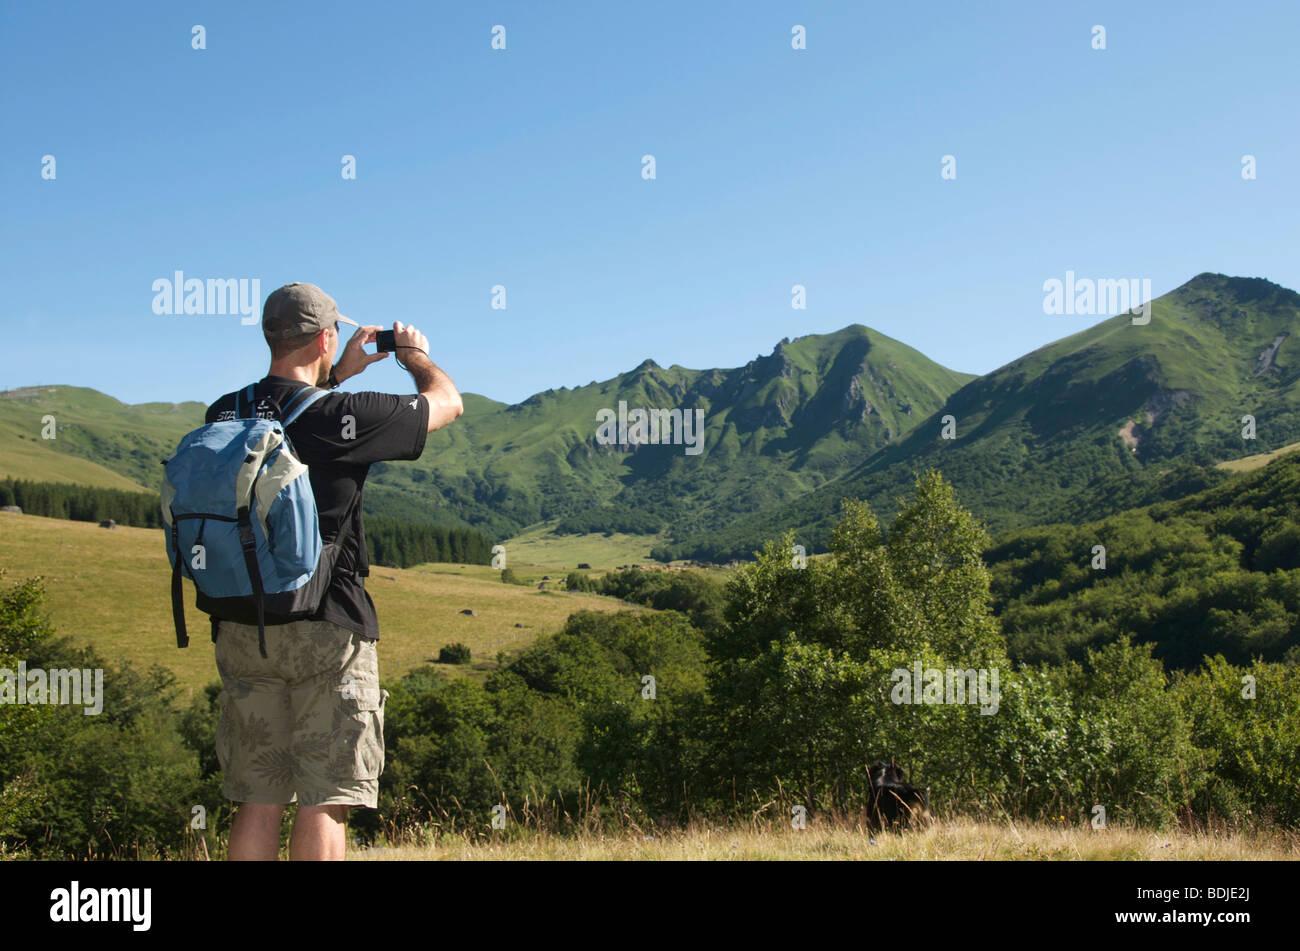 Wanderer / Walker im Massif du Sancy, Auvergne, Frankreich - fotografieren der Landschaft. Stockbild